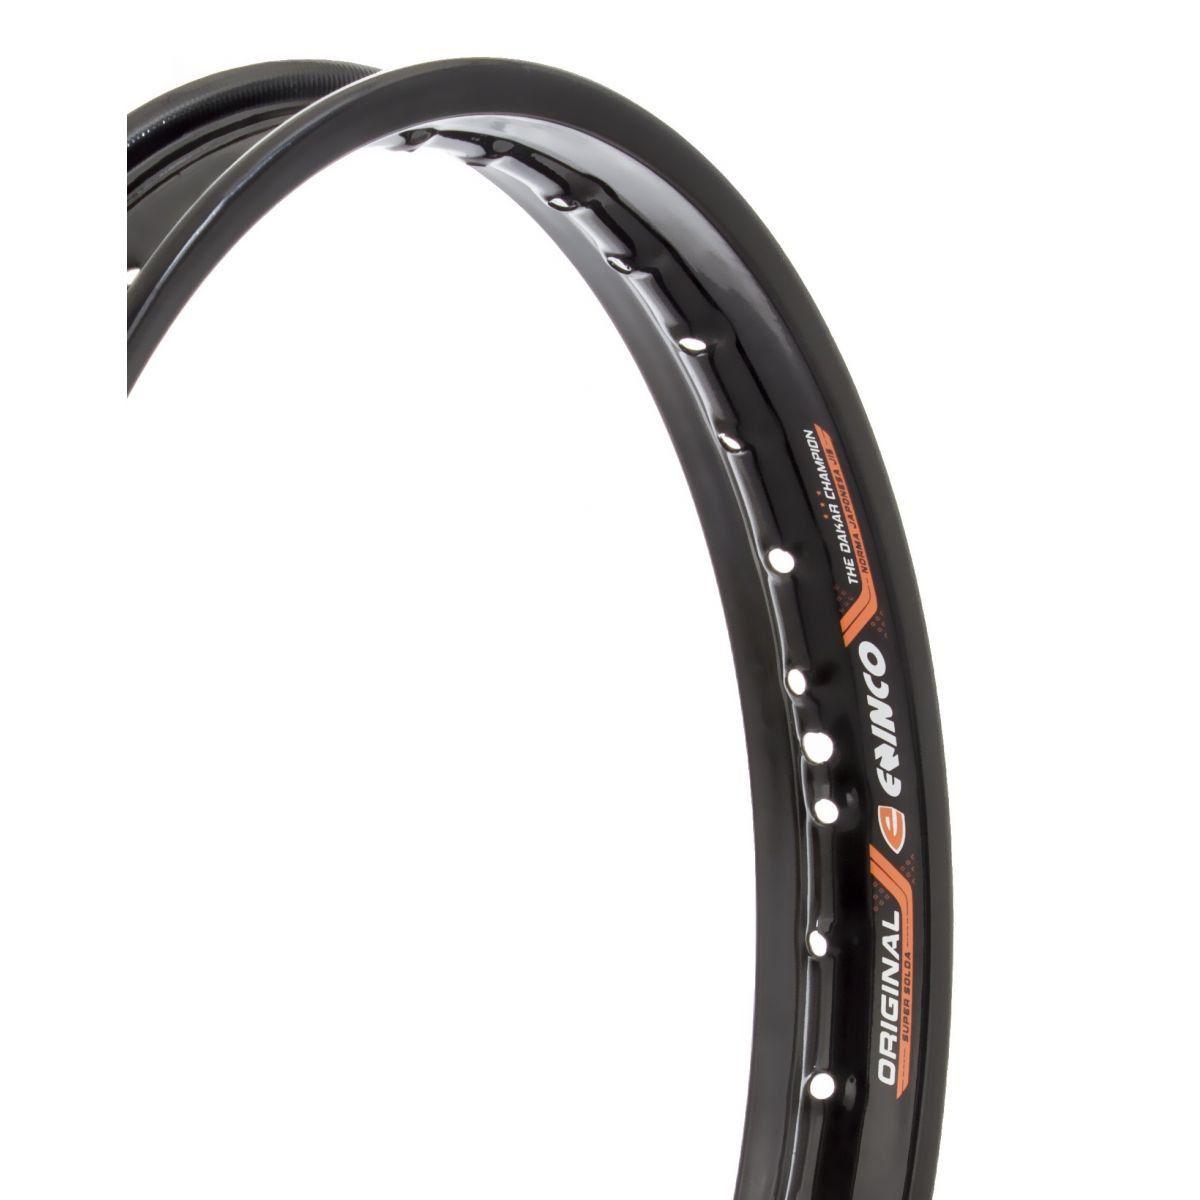 Aro de Moto Dianteiro Honda Biz 100 / Biz 125 - 1.20 X 17 - Preto - Eninco